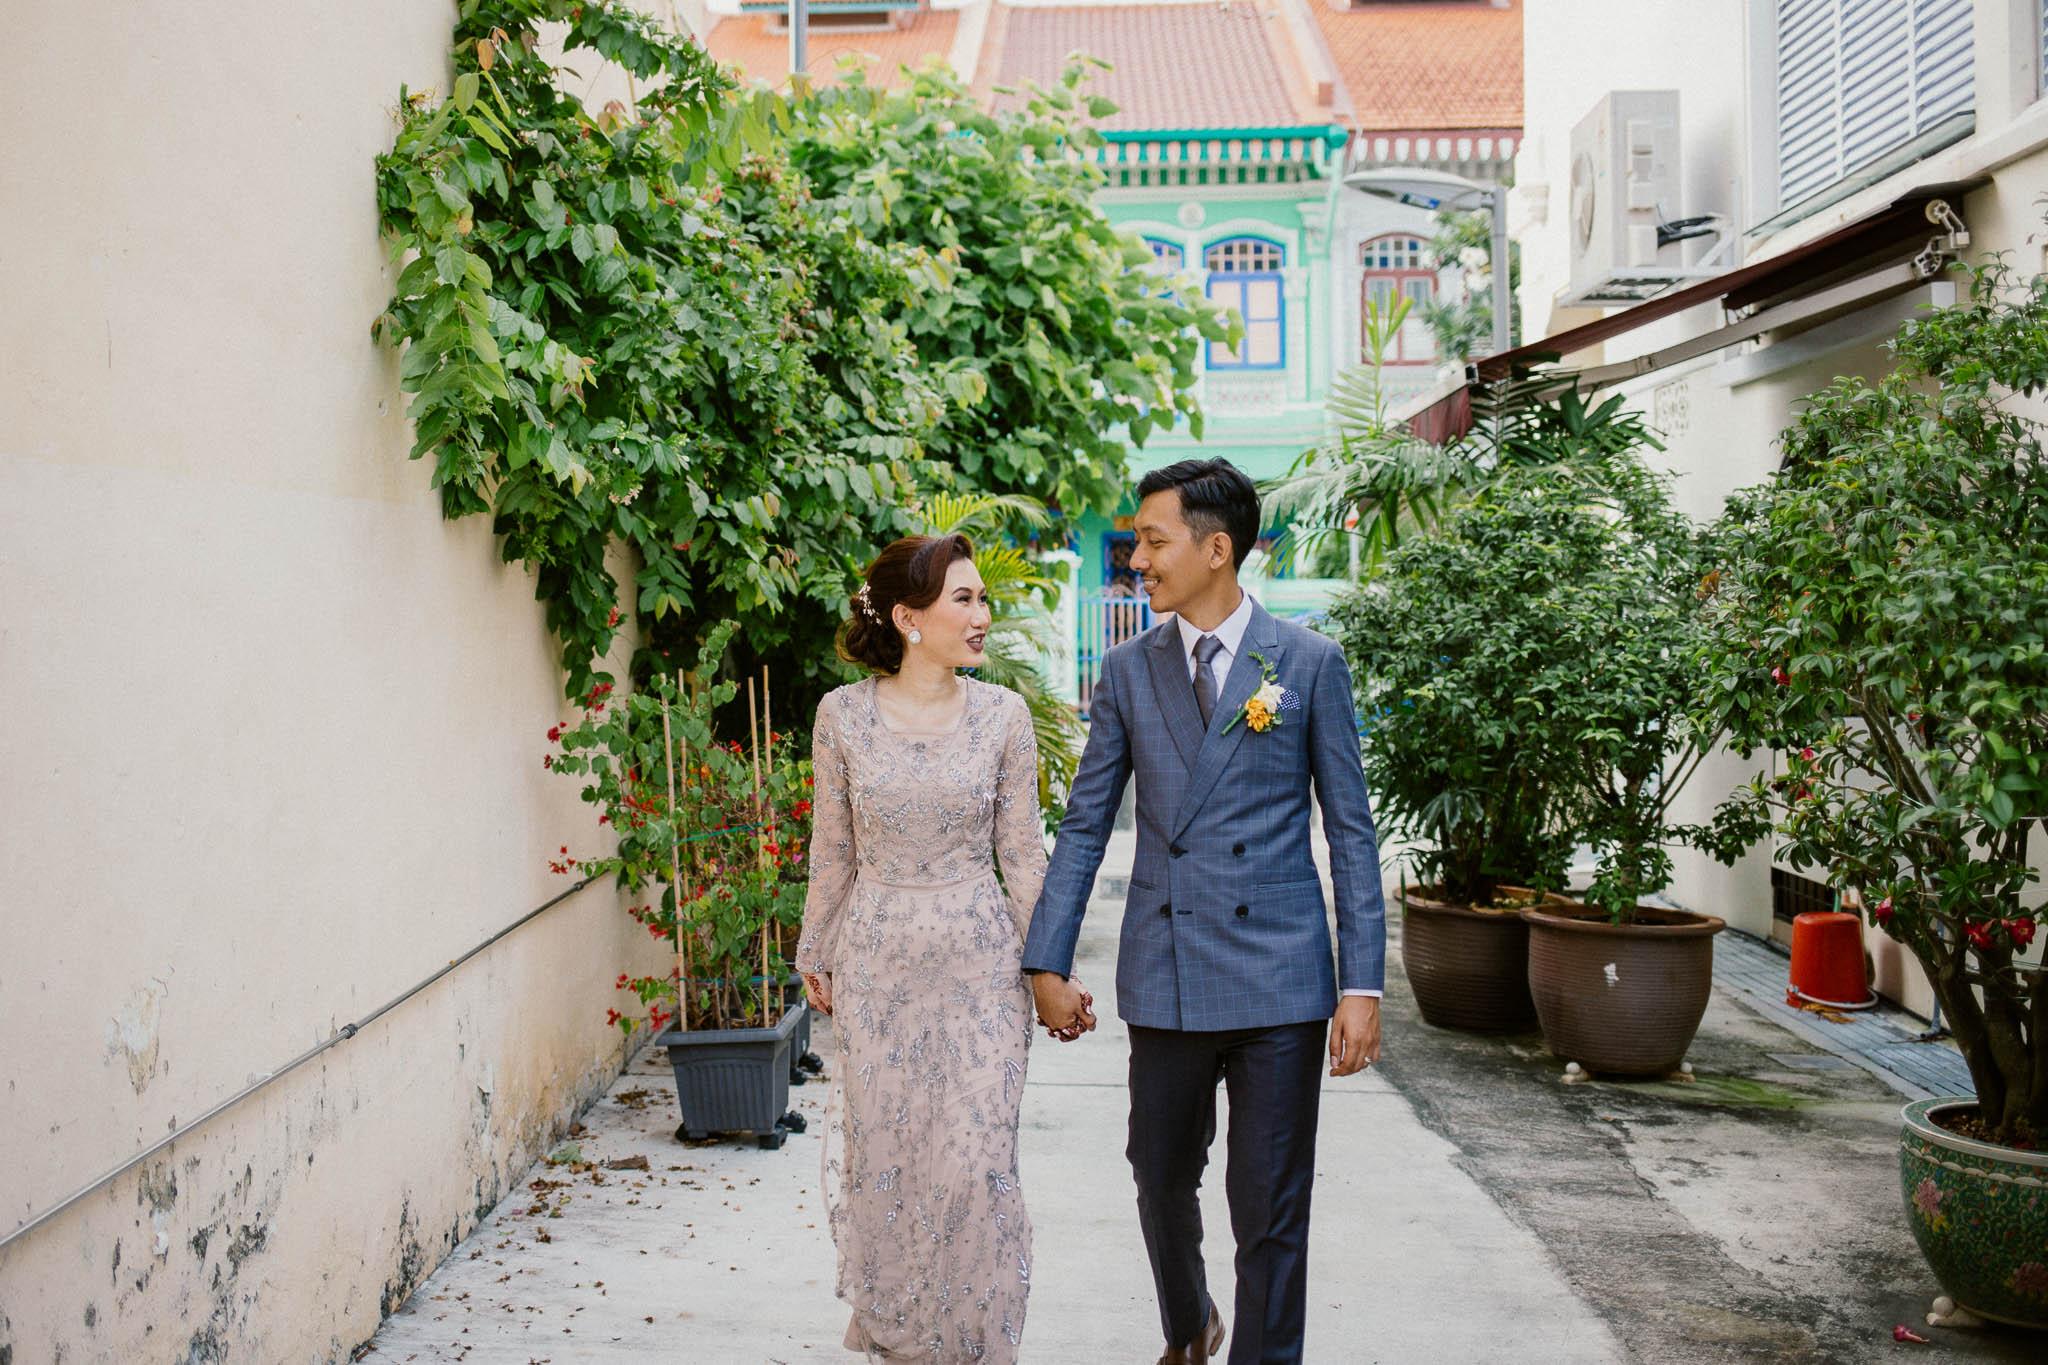 singapore-wedding-photographer-addafiq-nufail-087.jpg